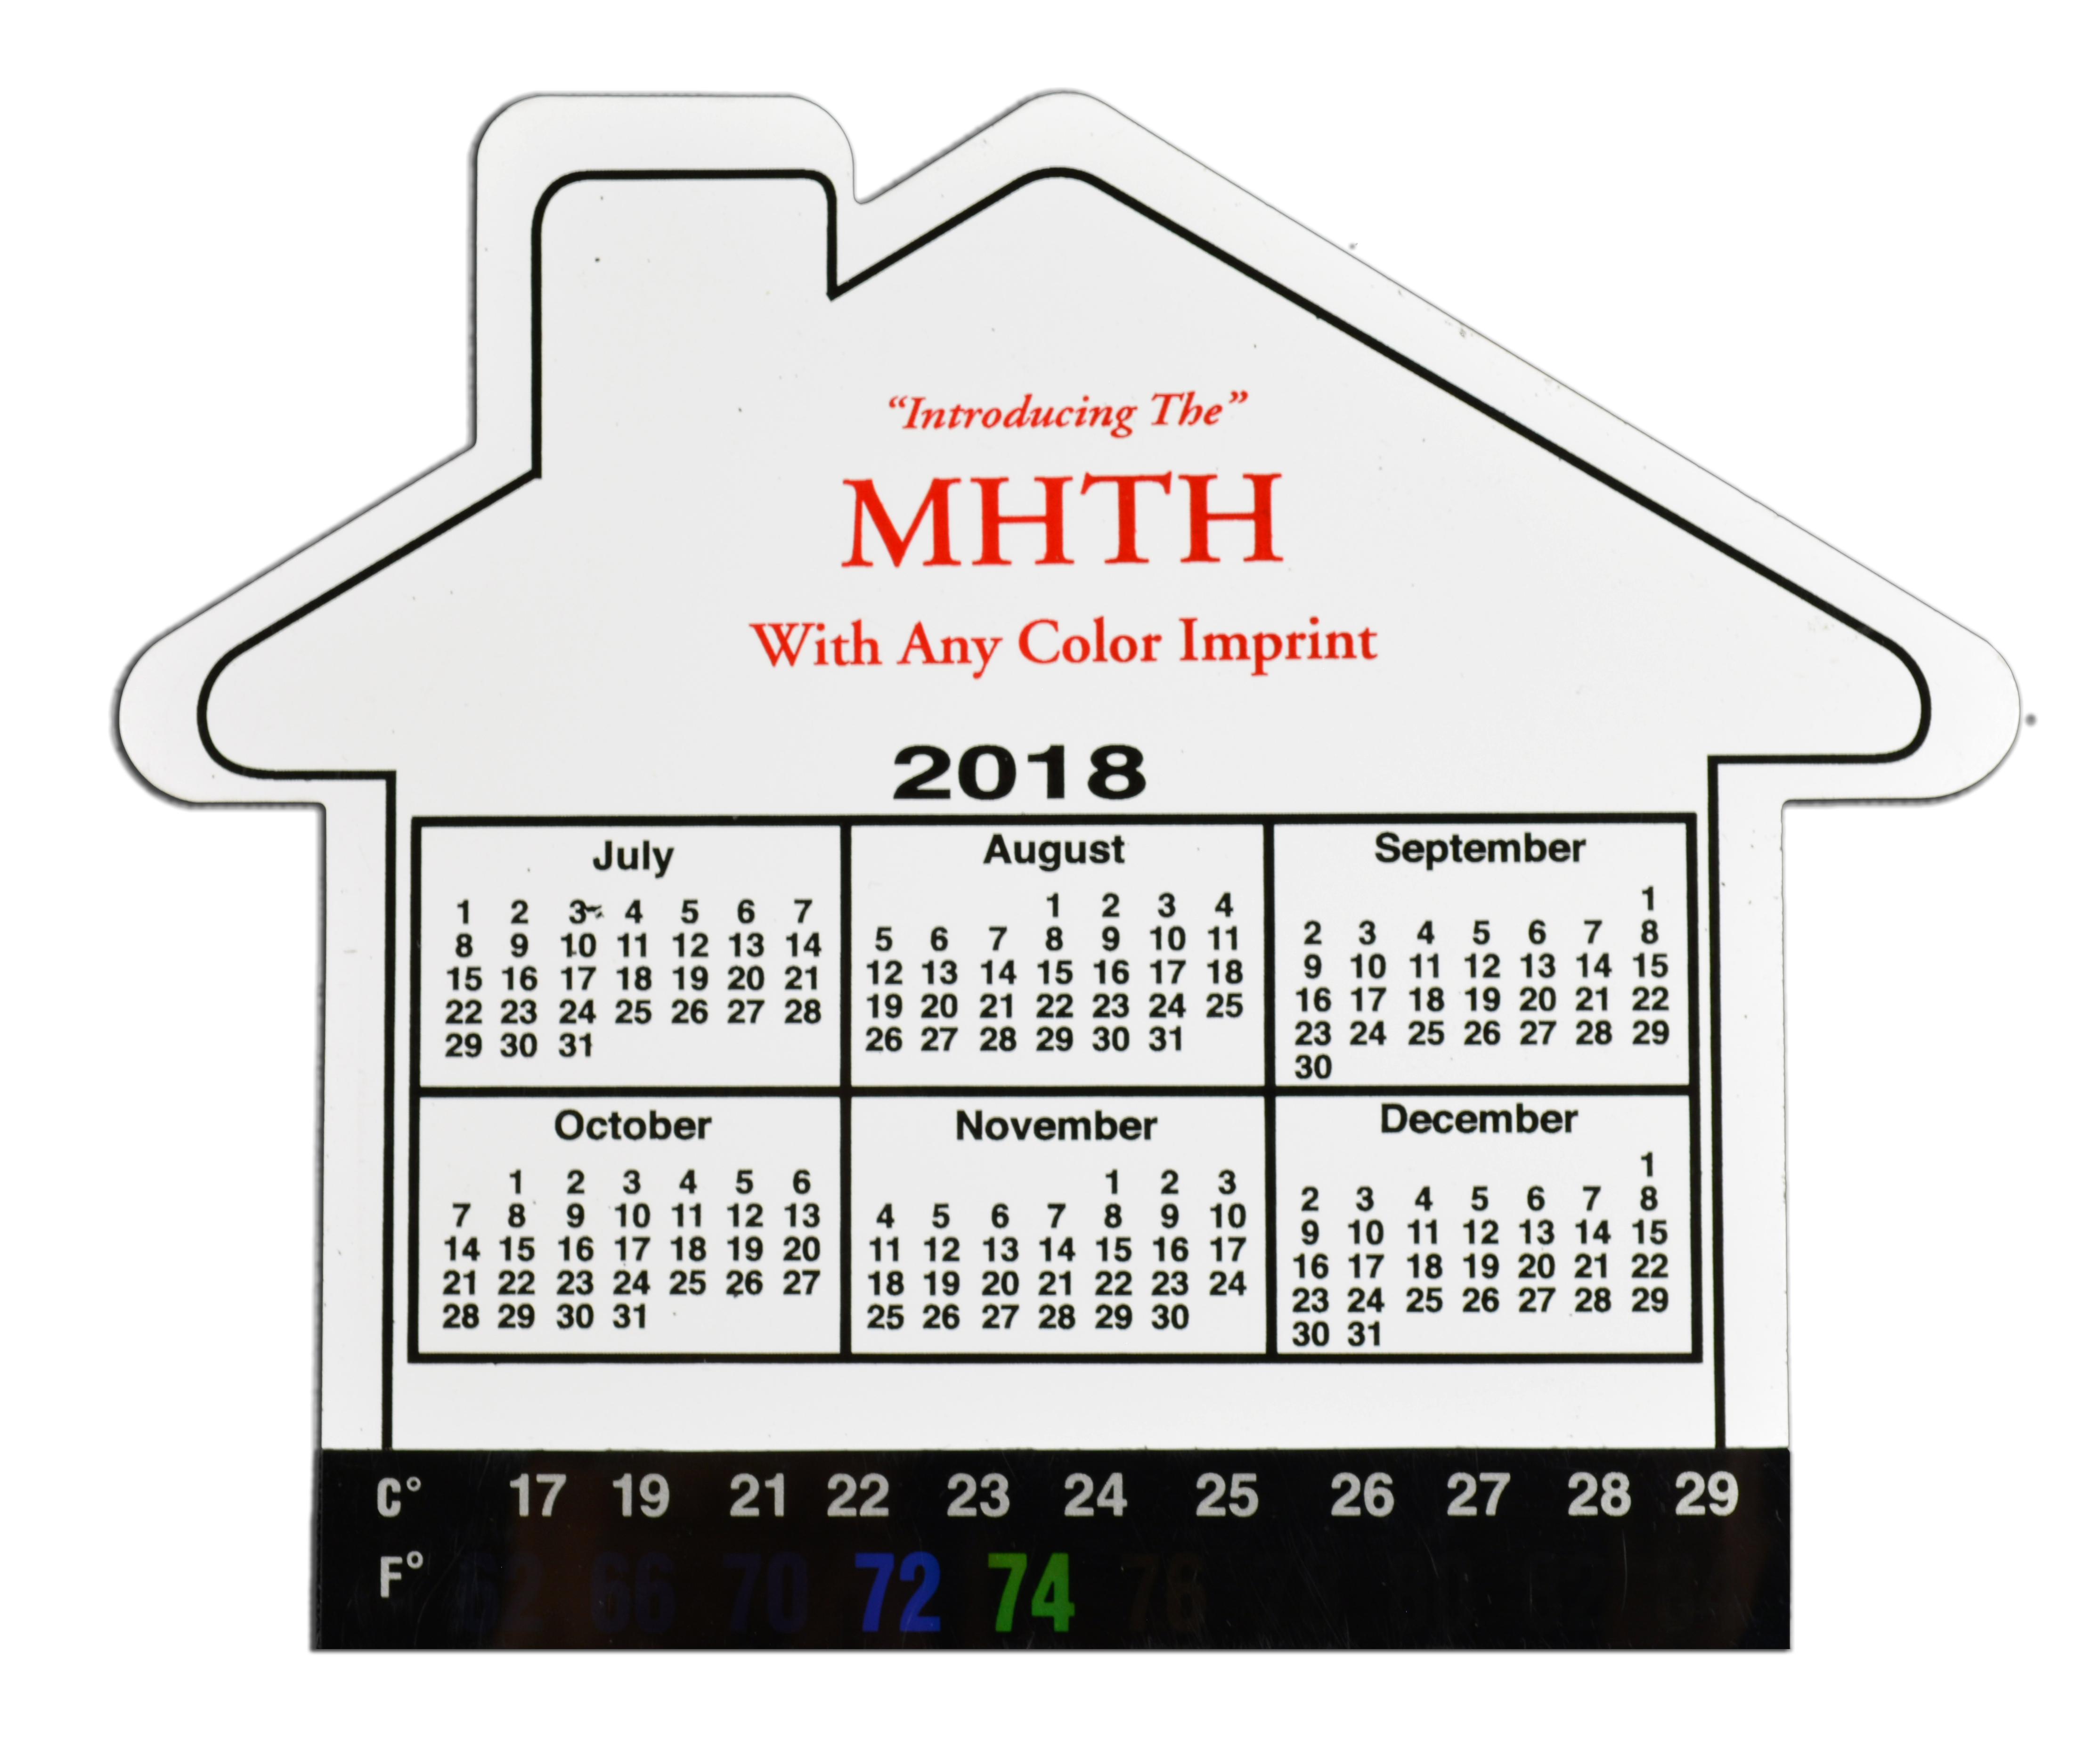 MHTH Image